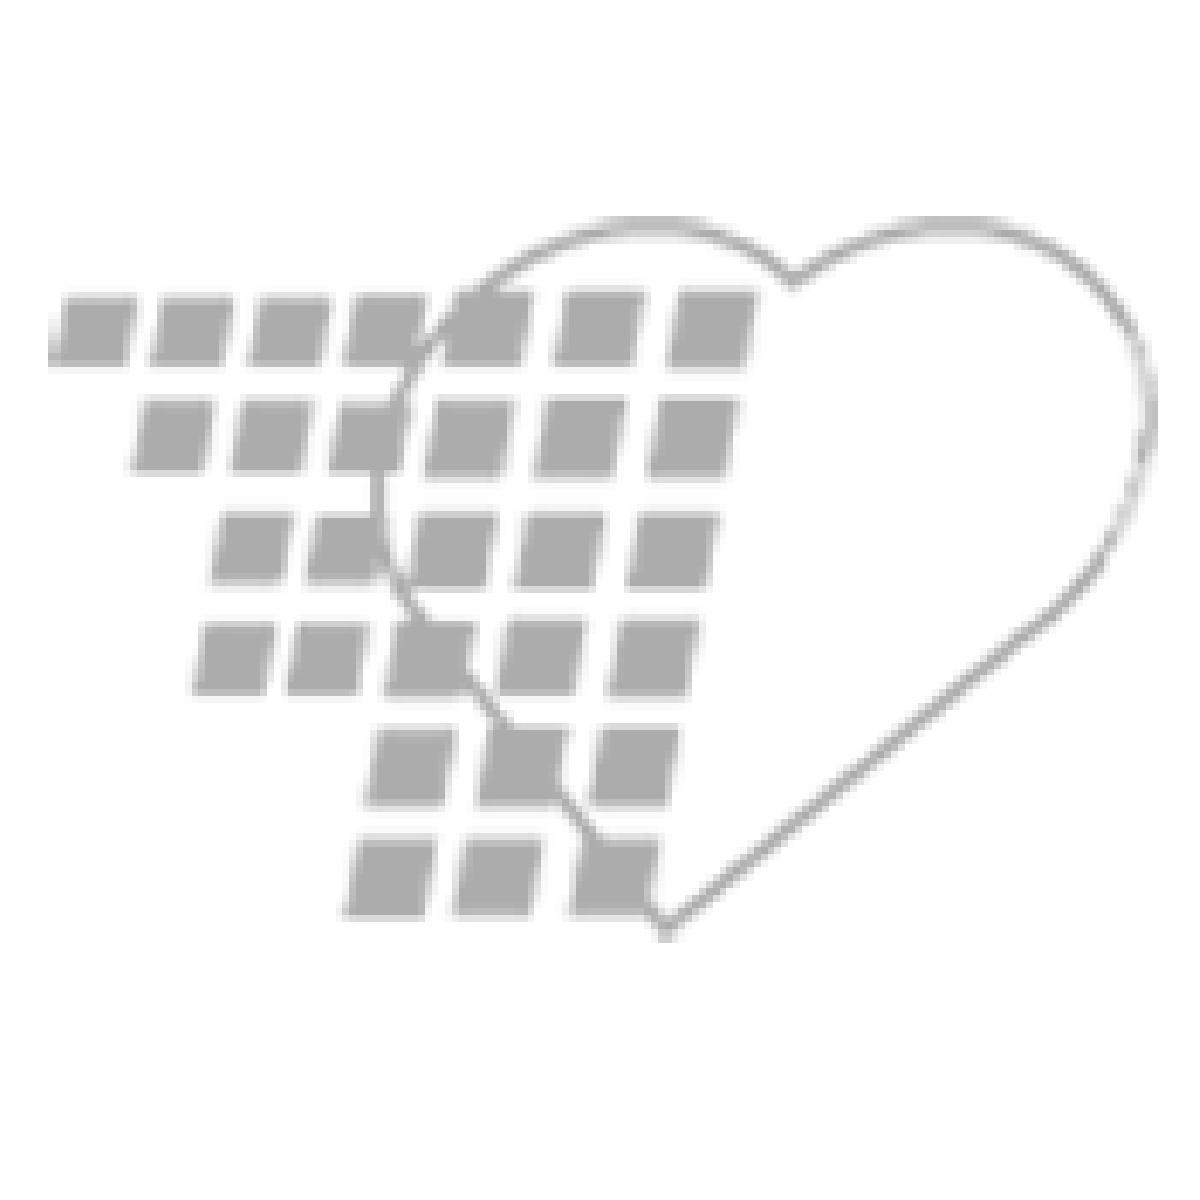 02-80-2109 Ultrascope® Teaching Stethoscopes - Confetti